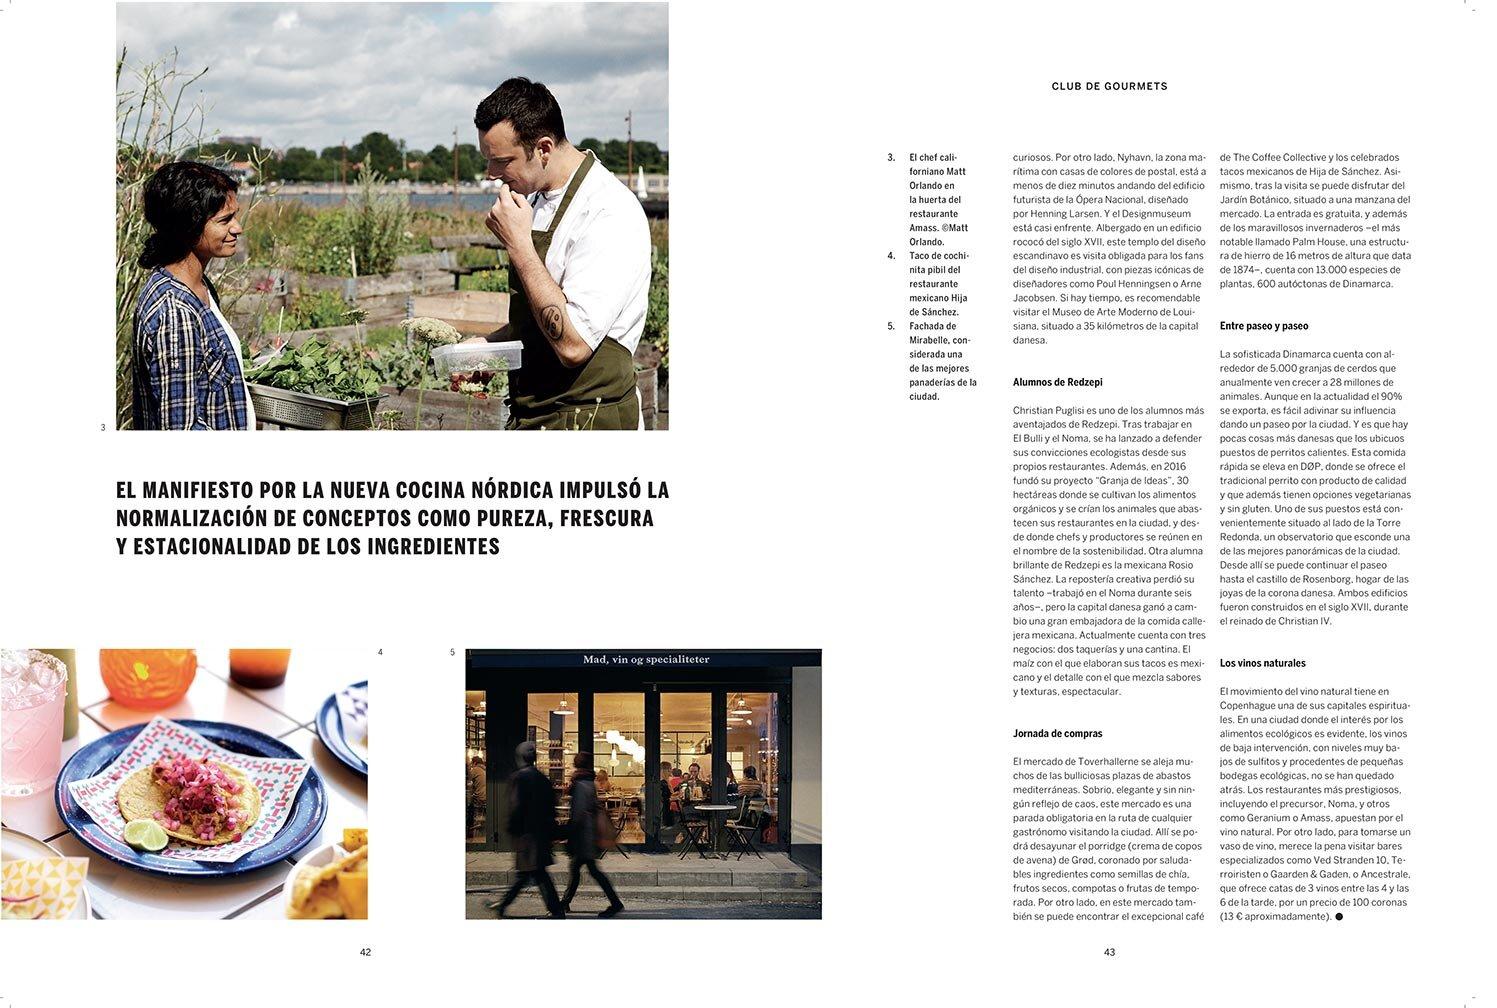 Copenhagen-food-Gourmets-magazine-MonicaRGoya-2.jpg